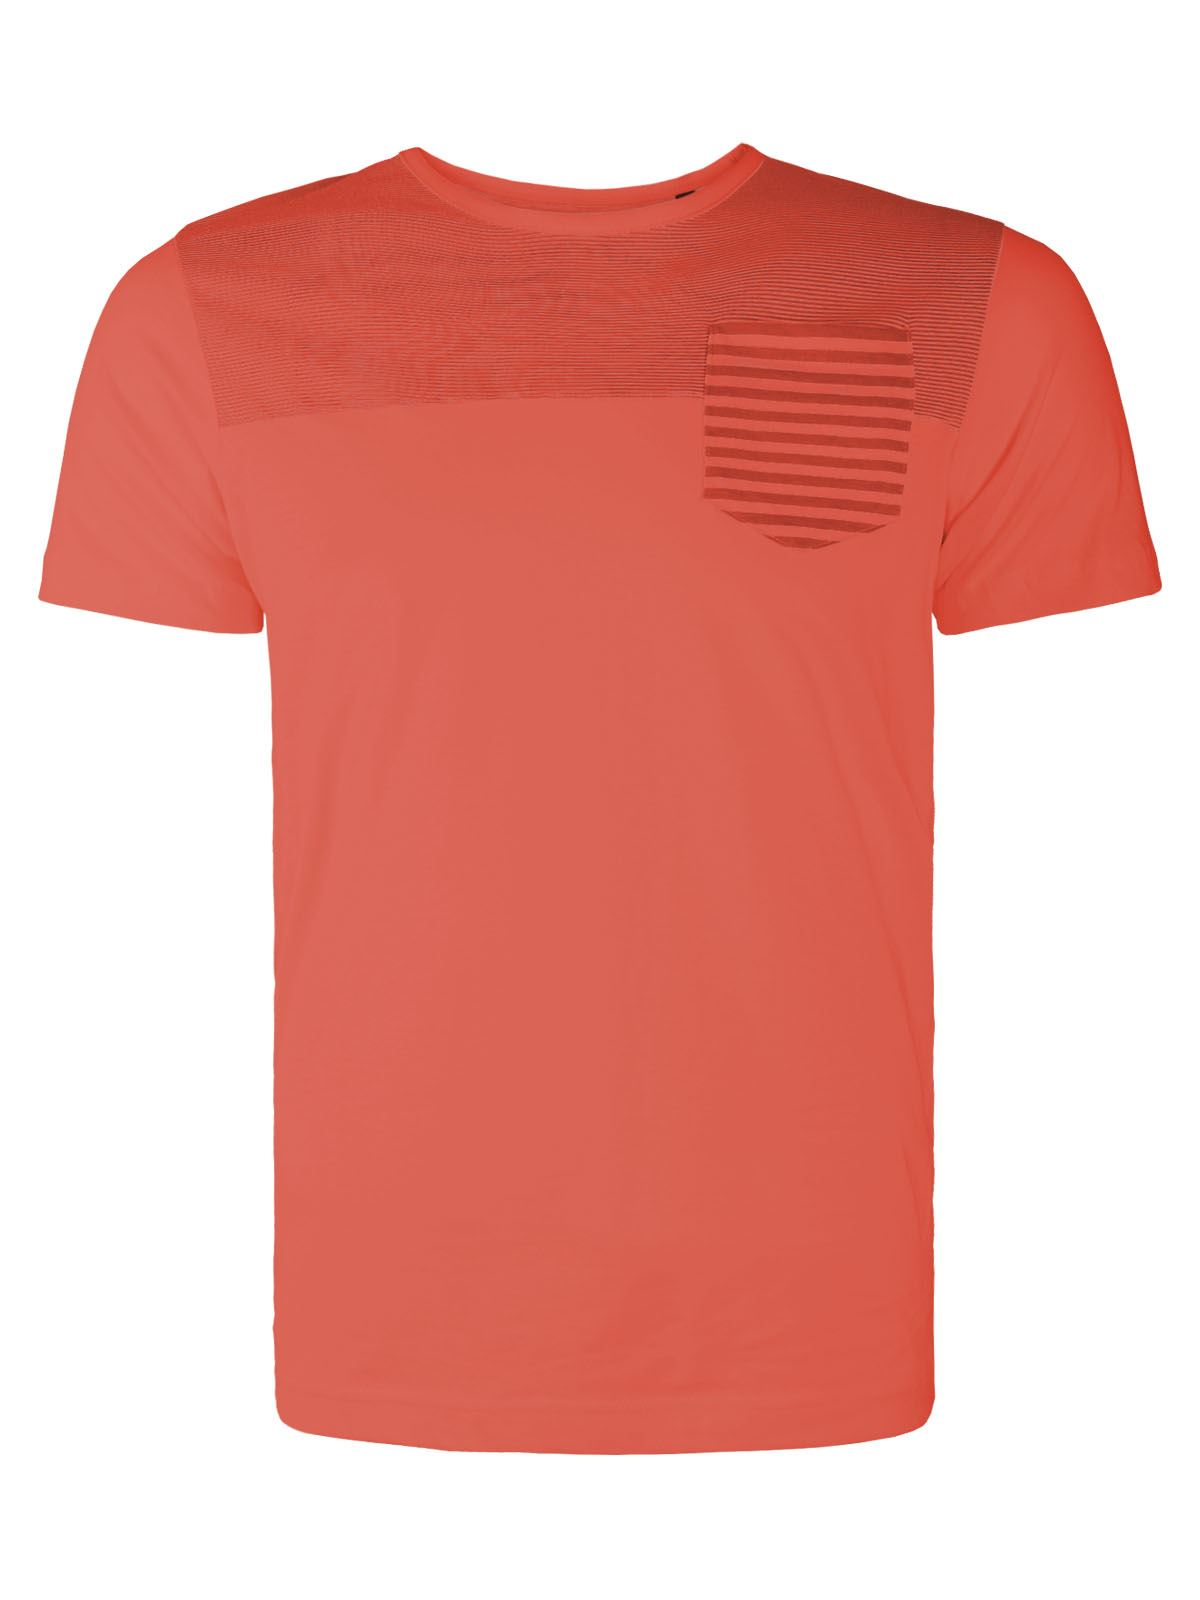 mens fashion top stripped cotton casual summer short sleeve pocket t shirt s xxl ebay. Black Bedroom Furniture Sets. Home Design Ideas